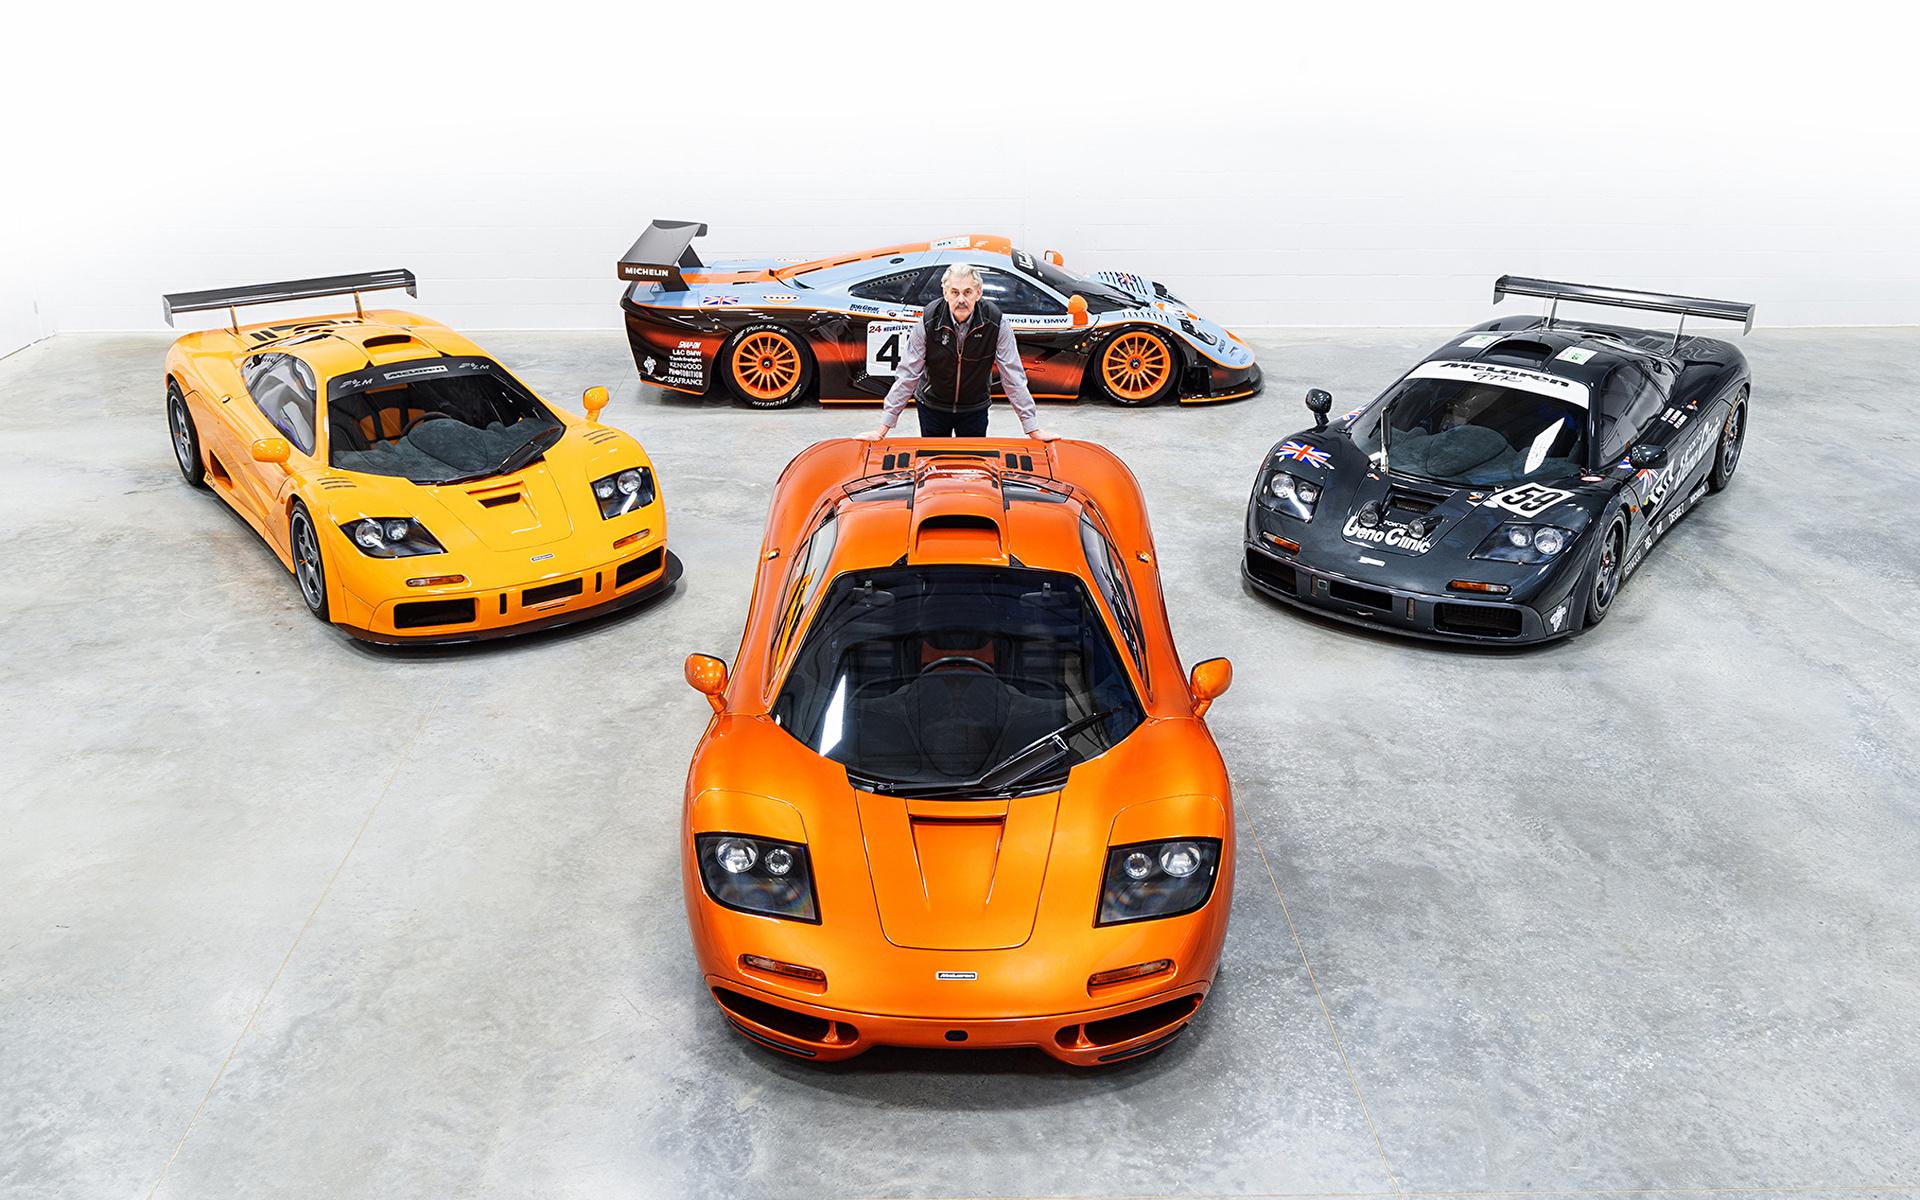 Achtergronden bureaublad Tuning McLaren Mannen F1, Gordon Murray Oranje Auto 1920x1200 een man auto's automobiel